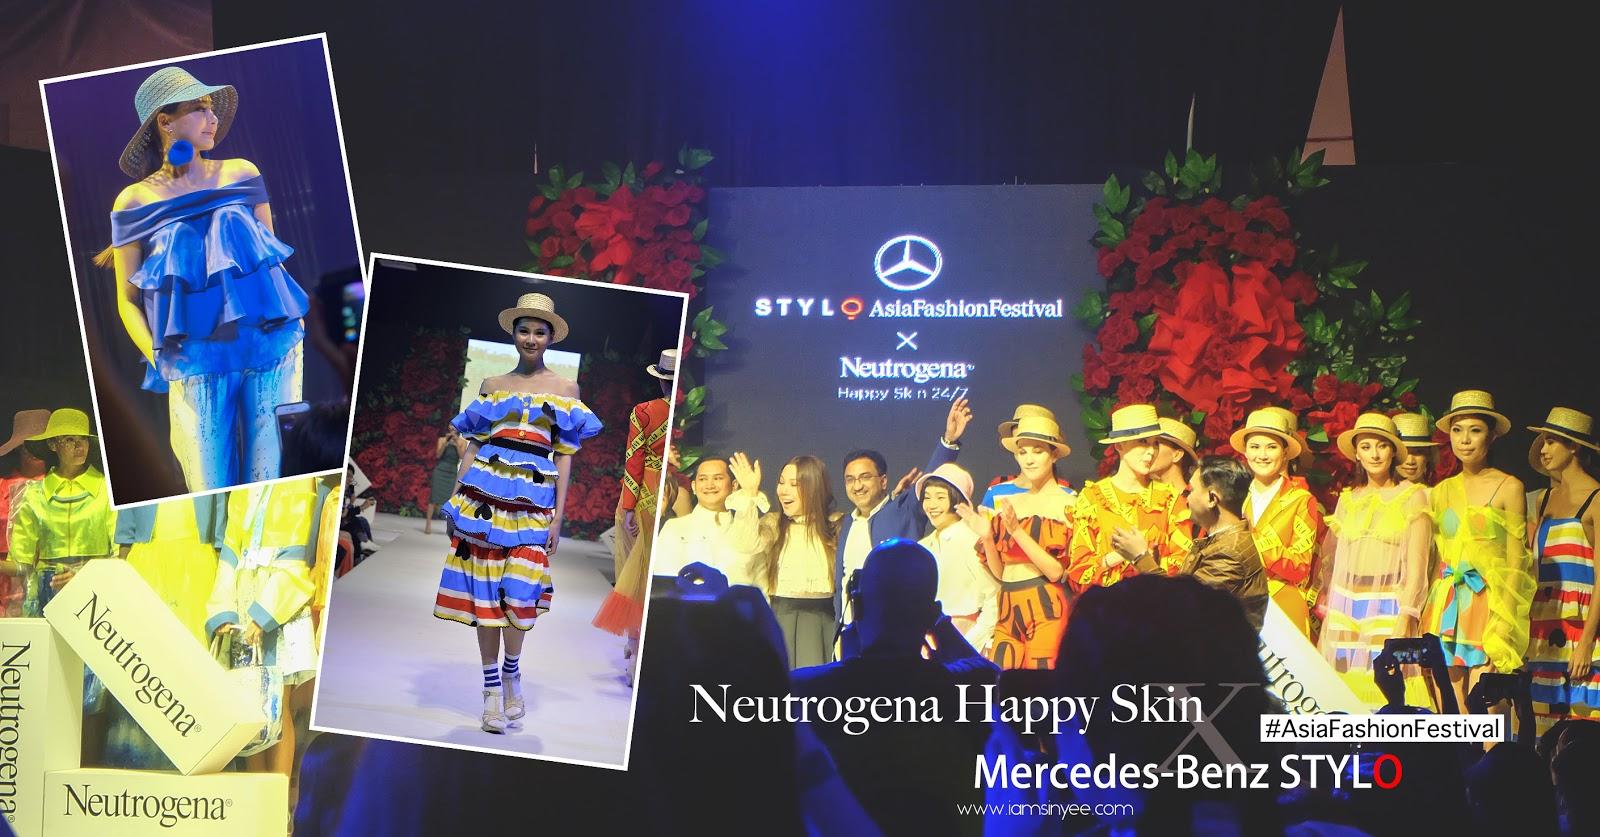 Neutrogena Happy Skin Night X Mercedes-Benz STYLO AsiaFashionFestival - I Am Sin Yee